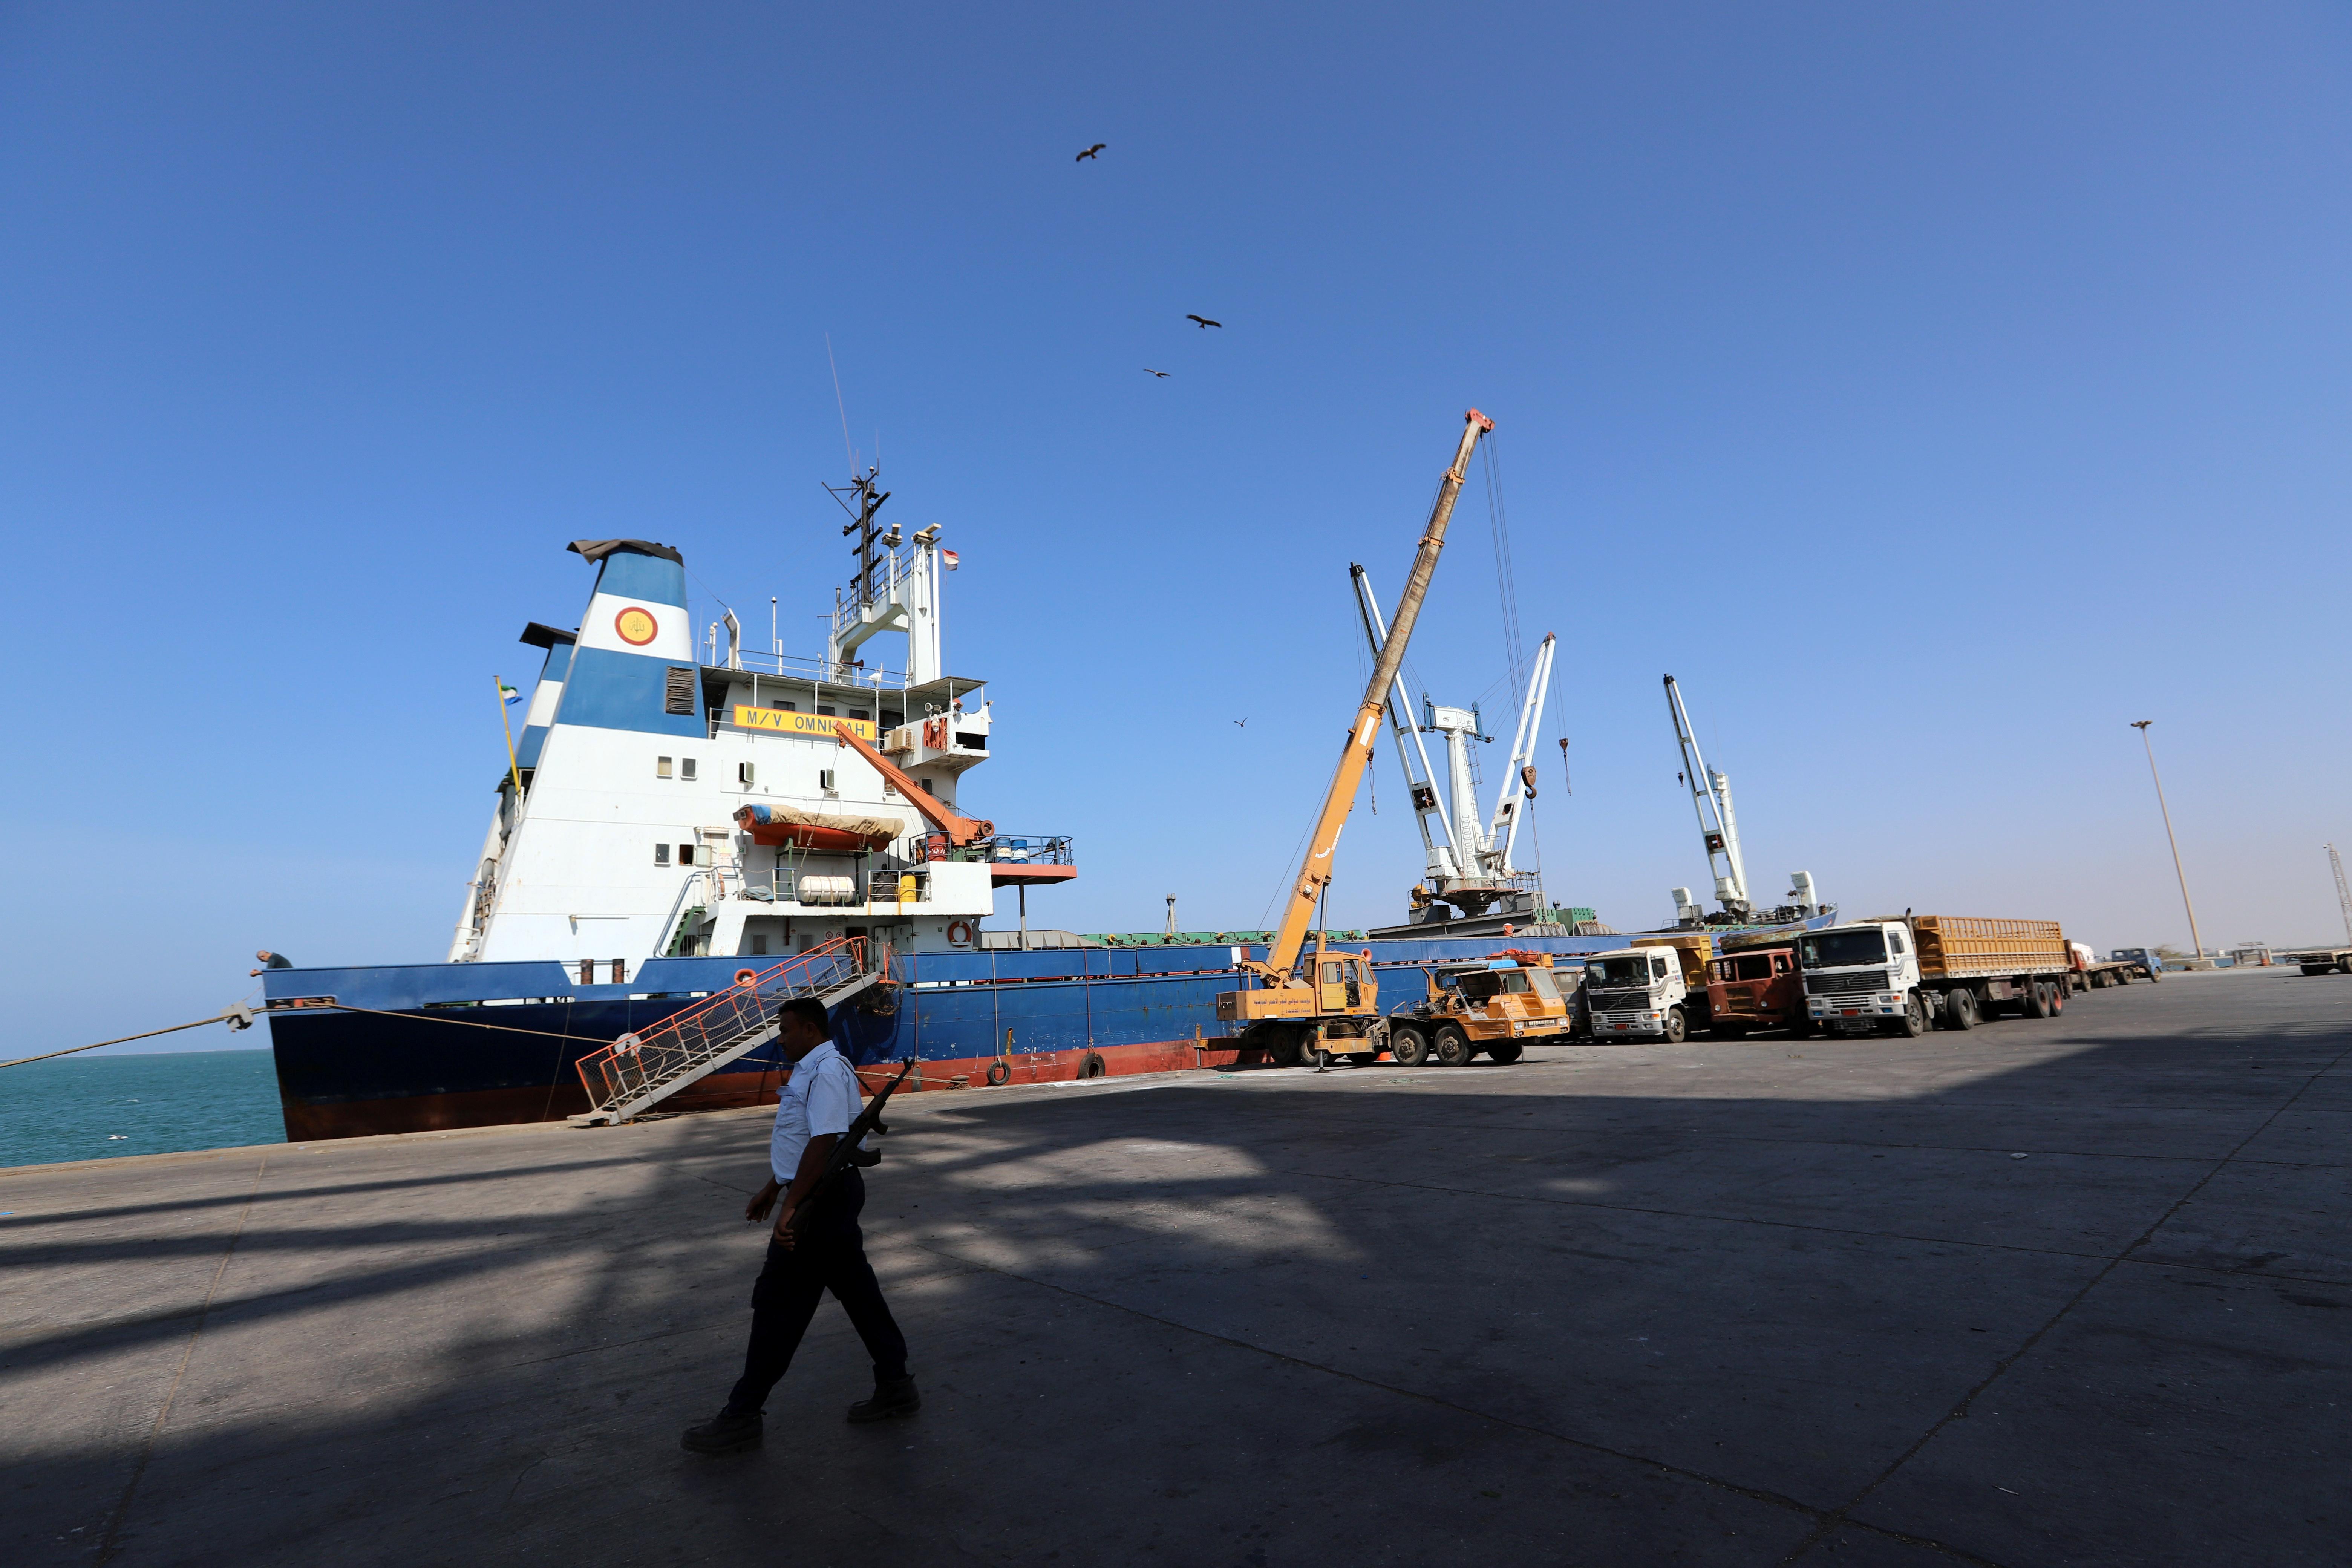 A coast guard walks past a ship docked at the Red Sea port of Hodeidah, Yemen January 5, 2019. Picture taken January 5, 2019. REUTERS/Abduljabbar Zeyad